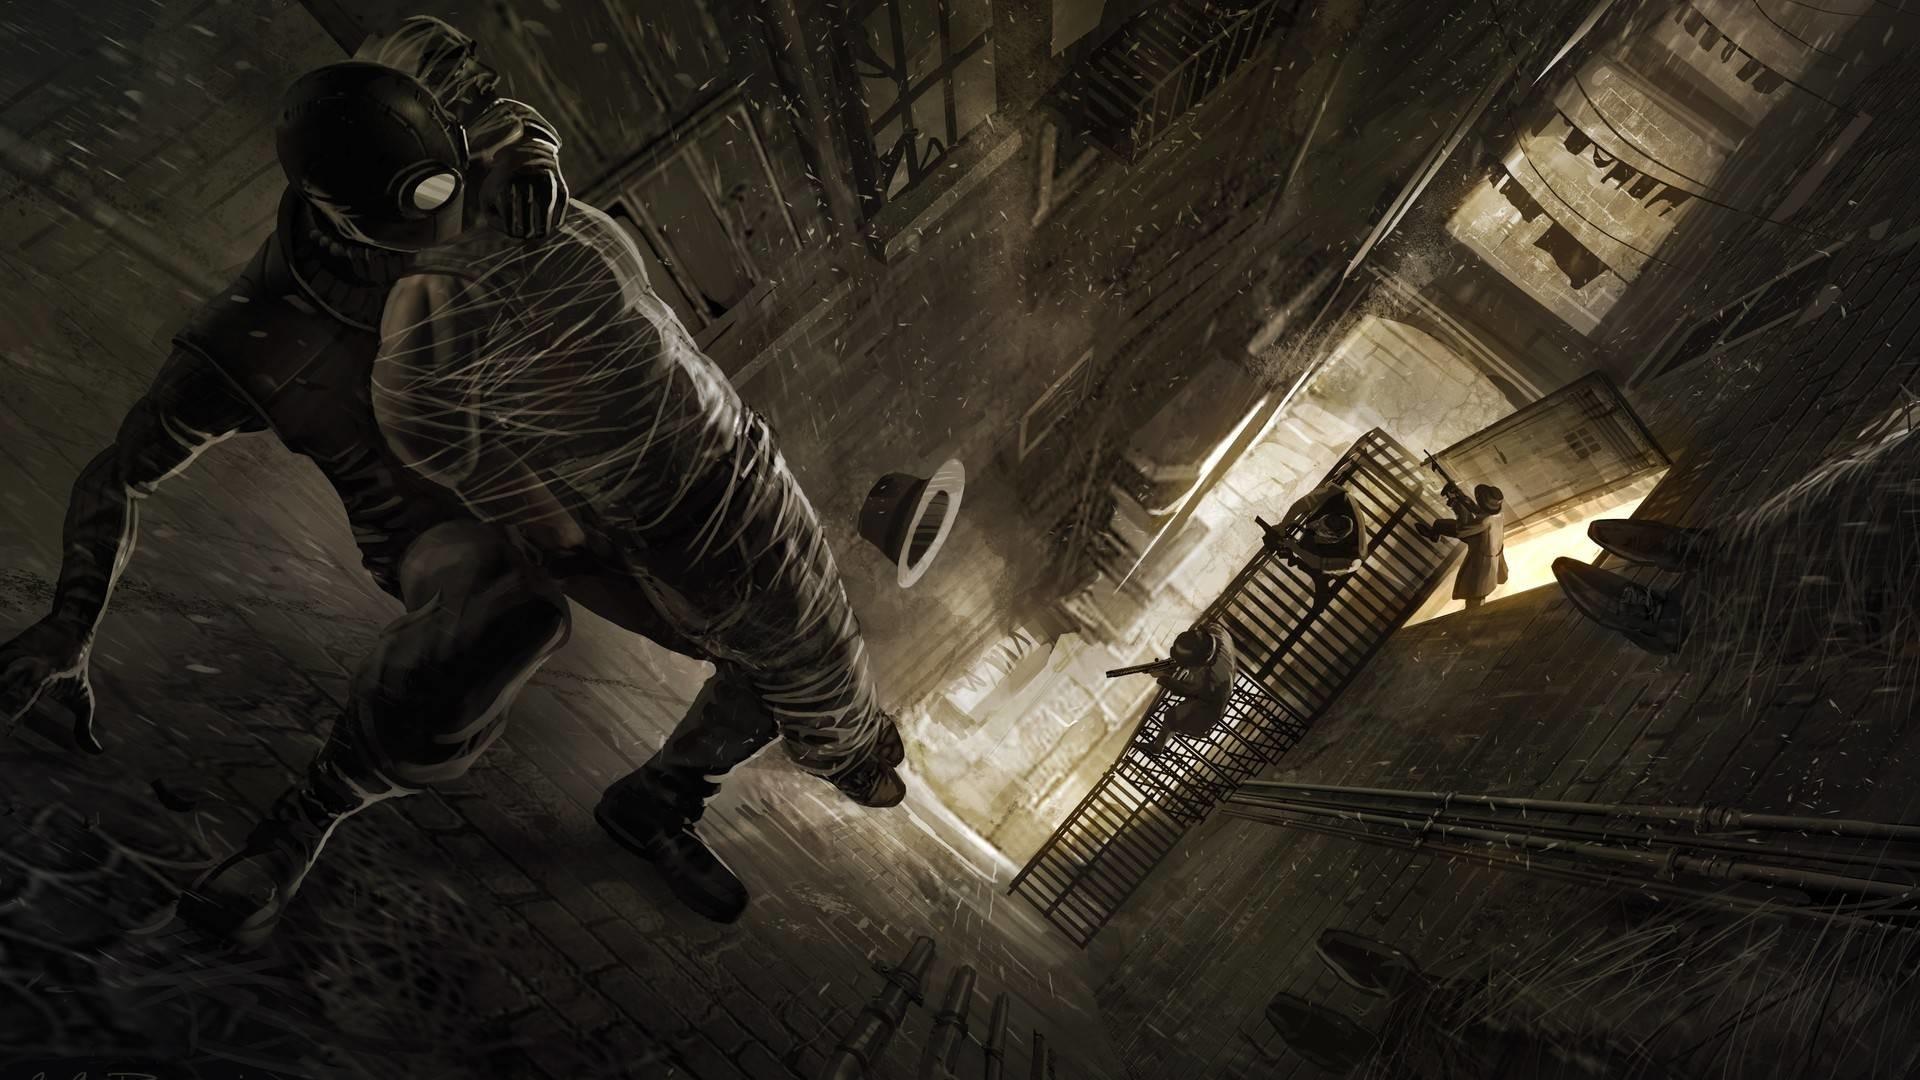 spider man noir wallpaper (69+ images)